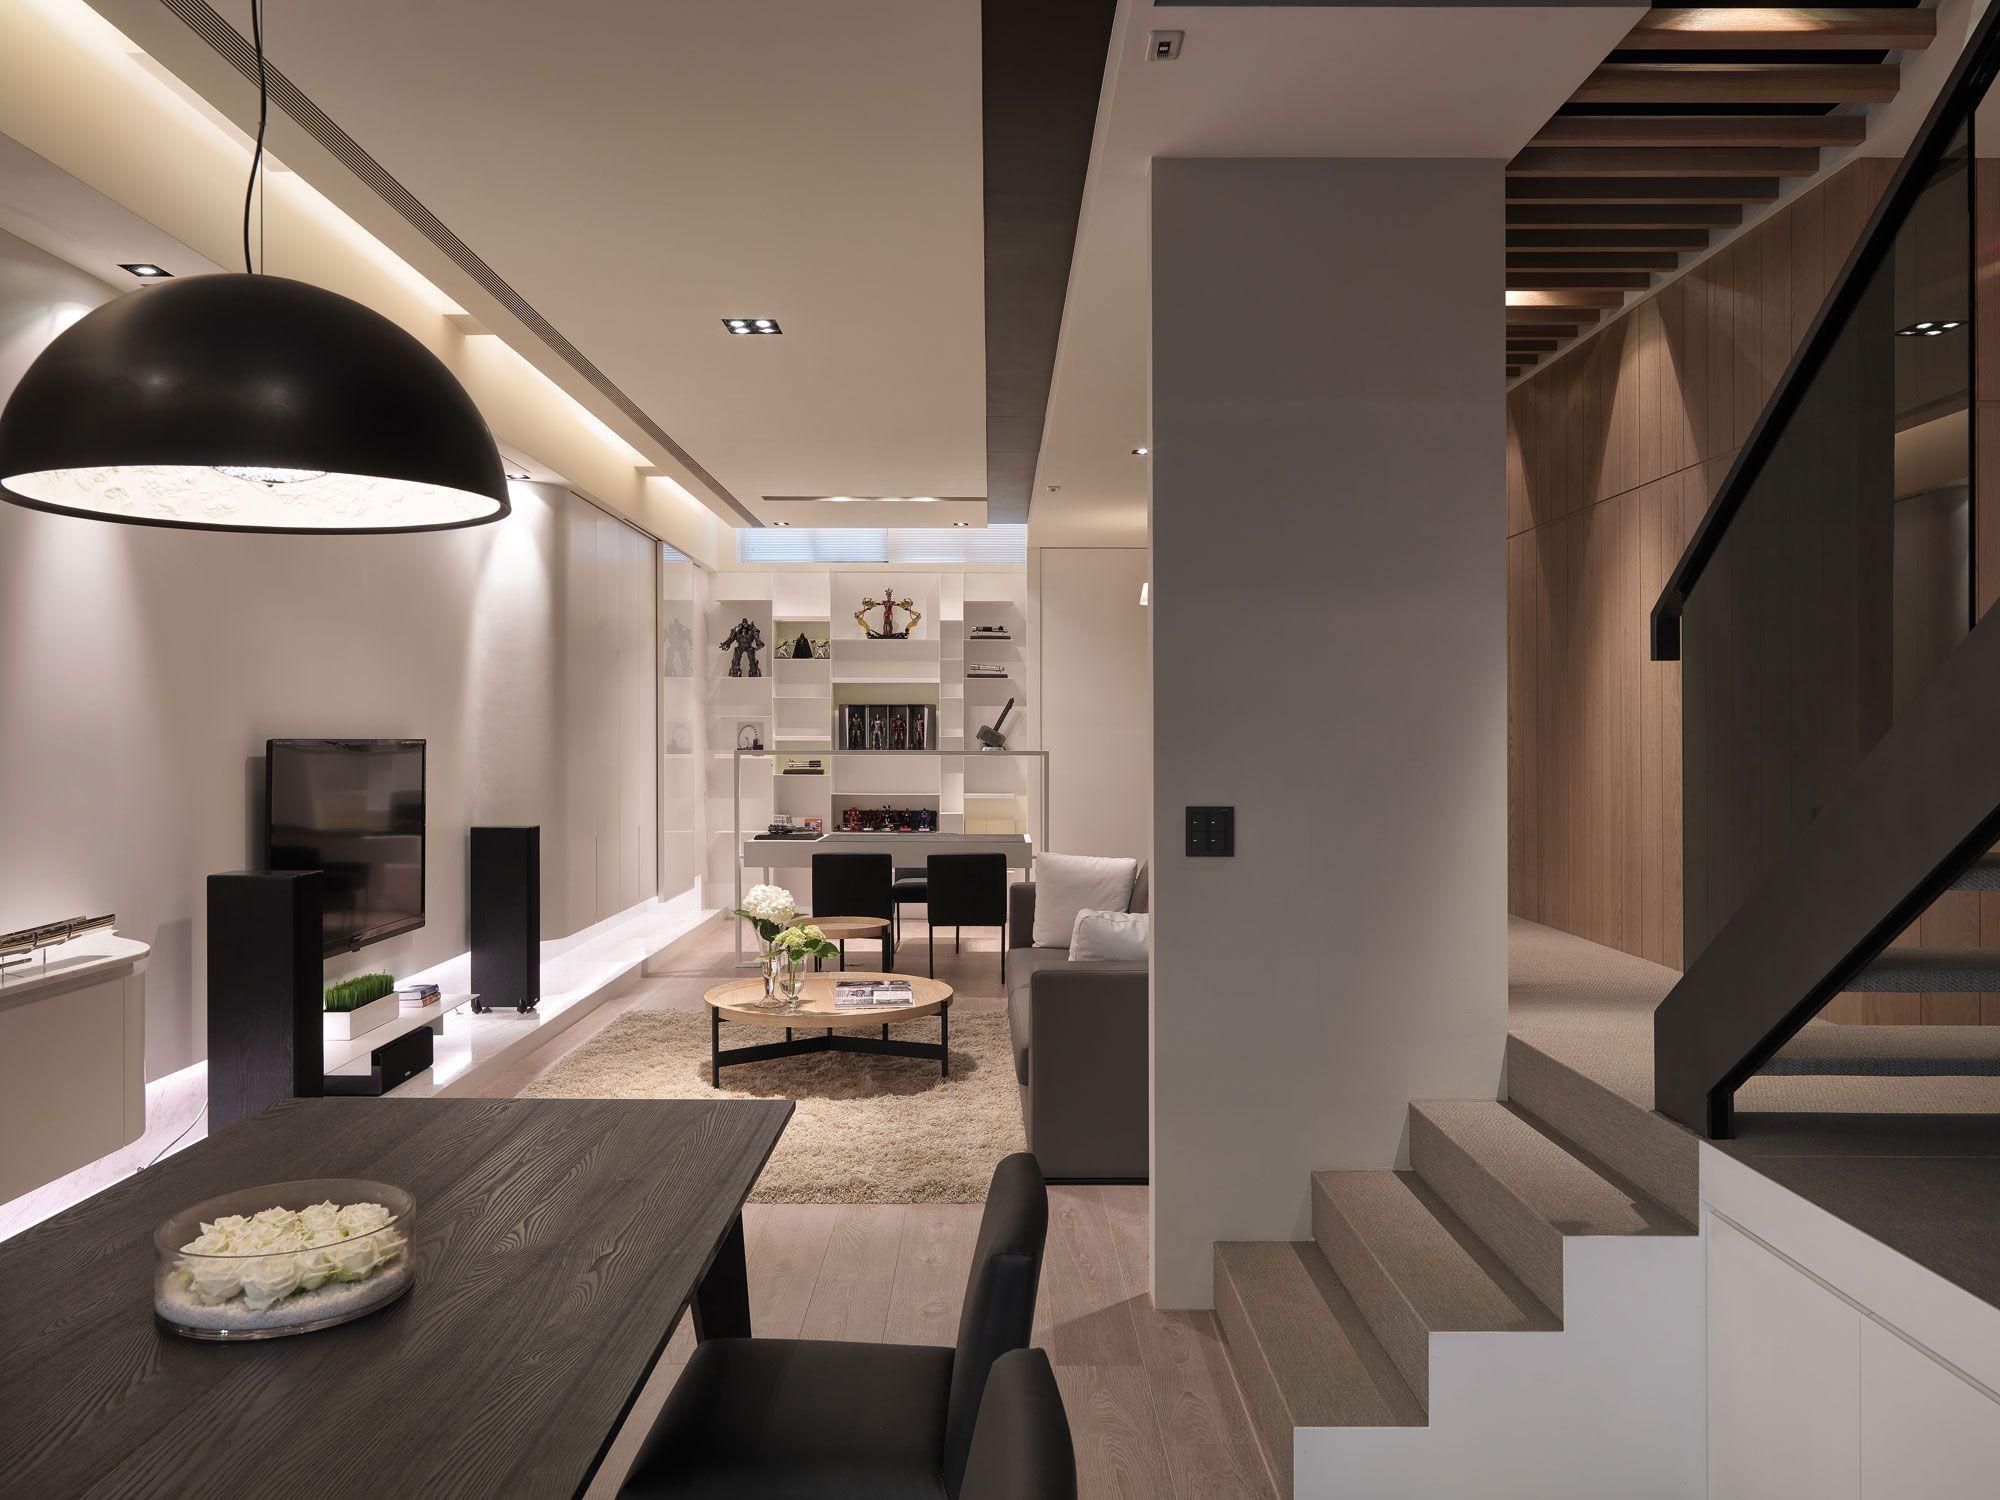 A-Multilevel-Contemporary-Apartment-11